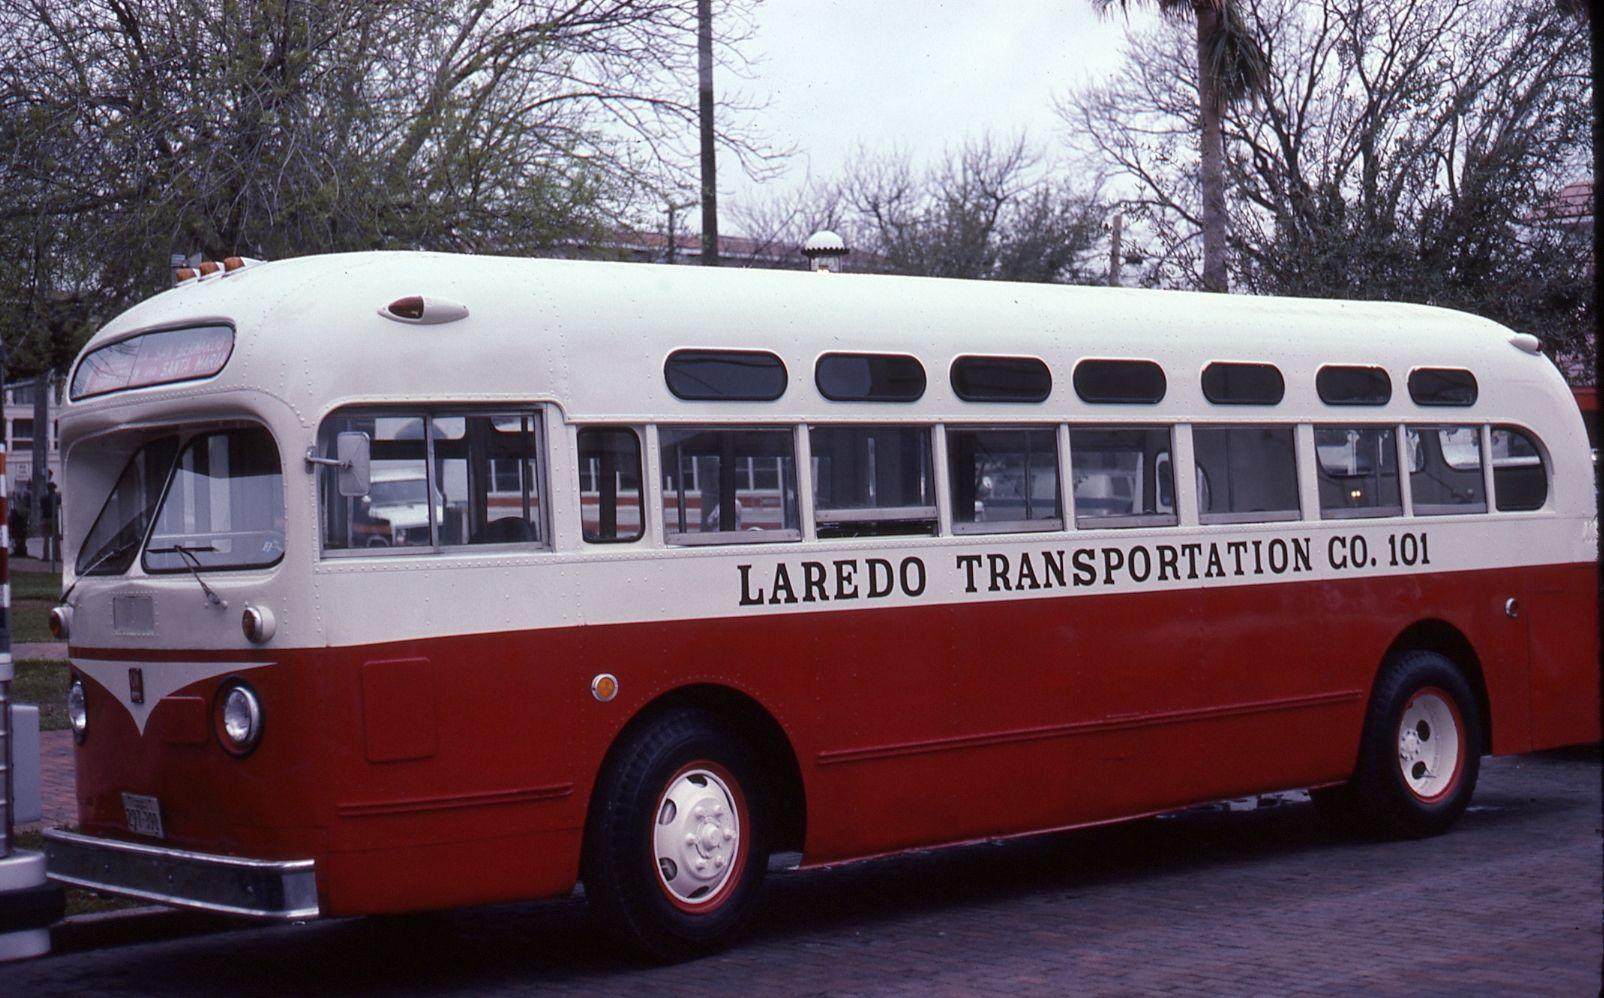 Laredo Transportation Co Old Look Gmc Laredo Bus Coach Touring